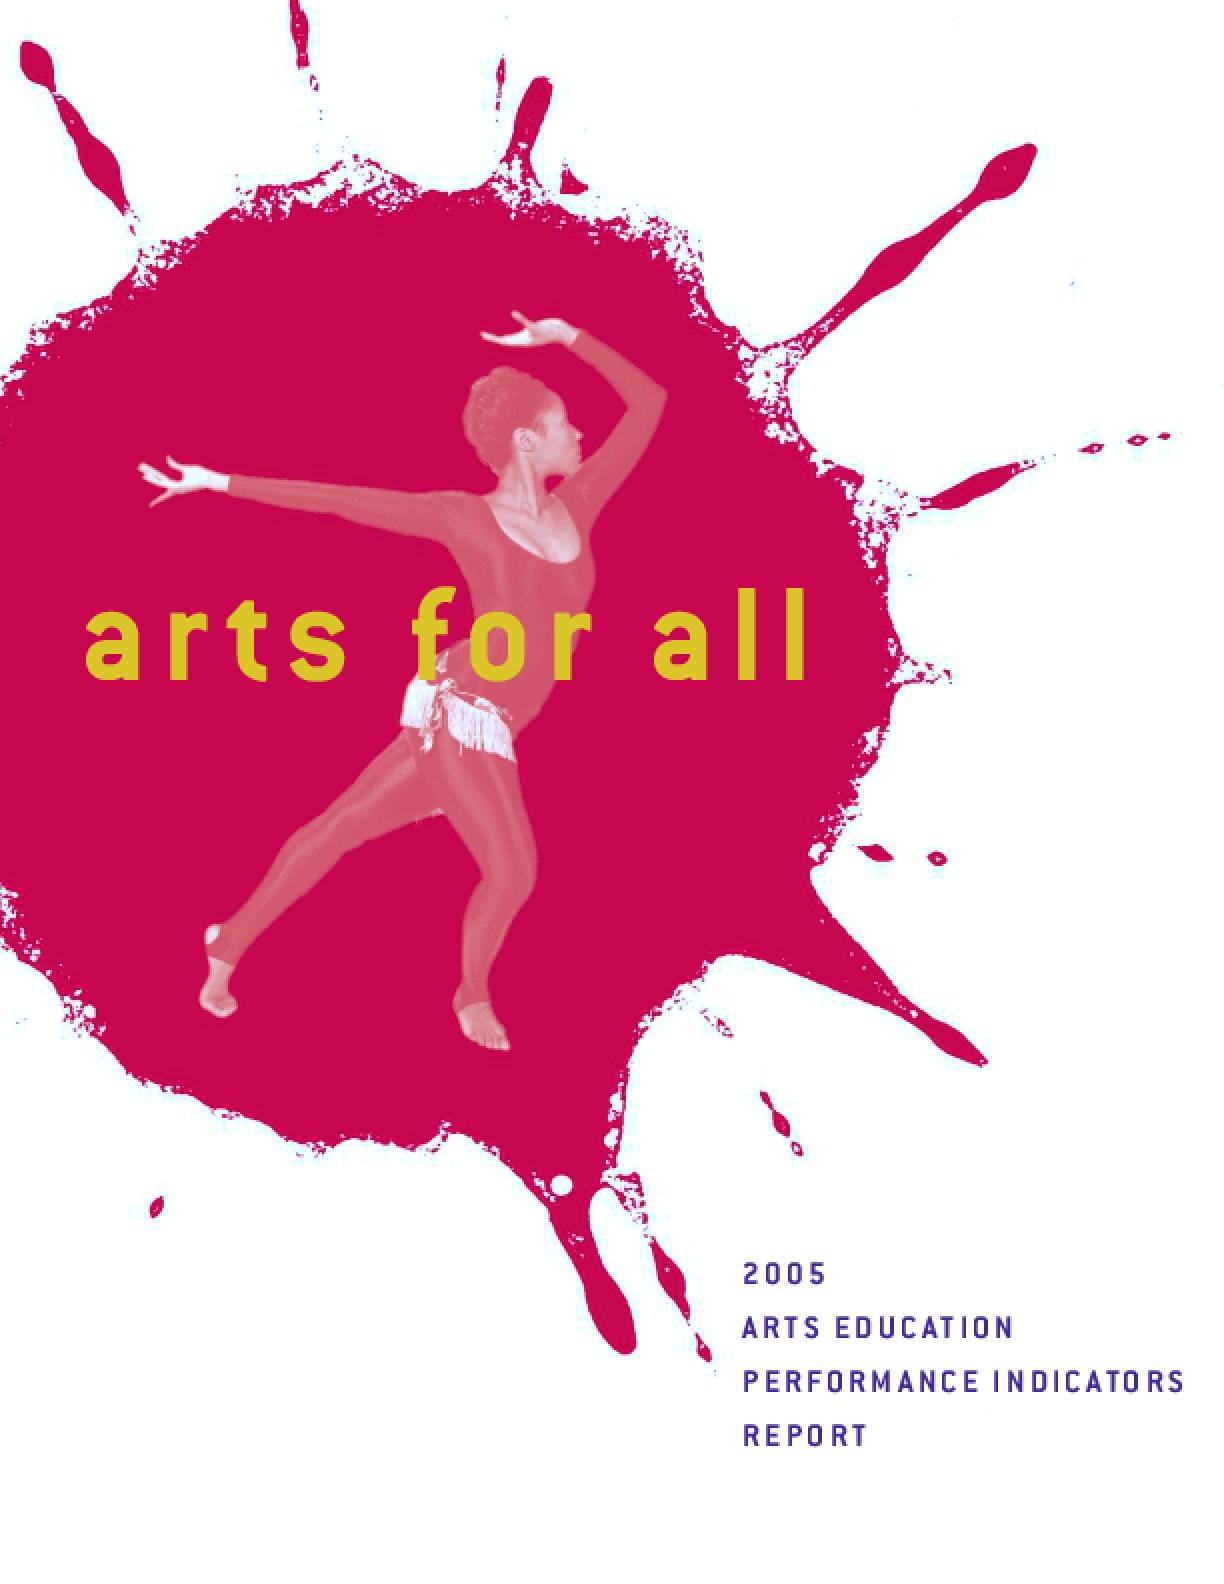 2005 Arts Education Performance Indicators Report